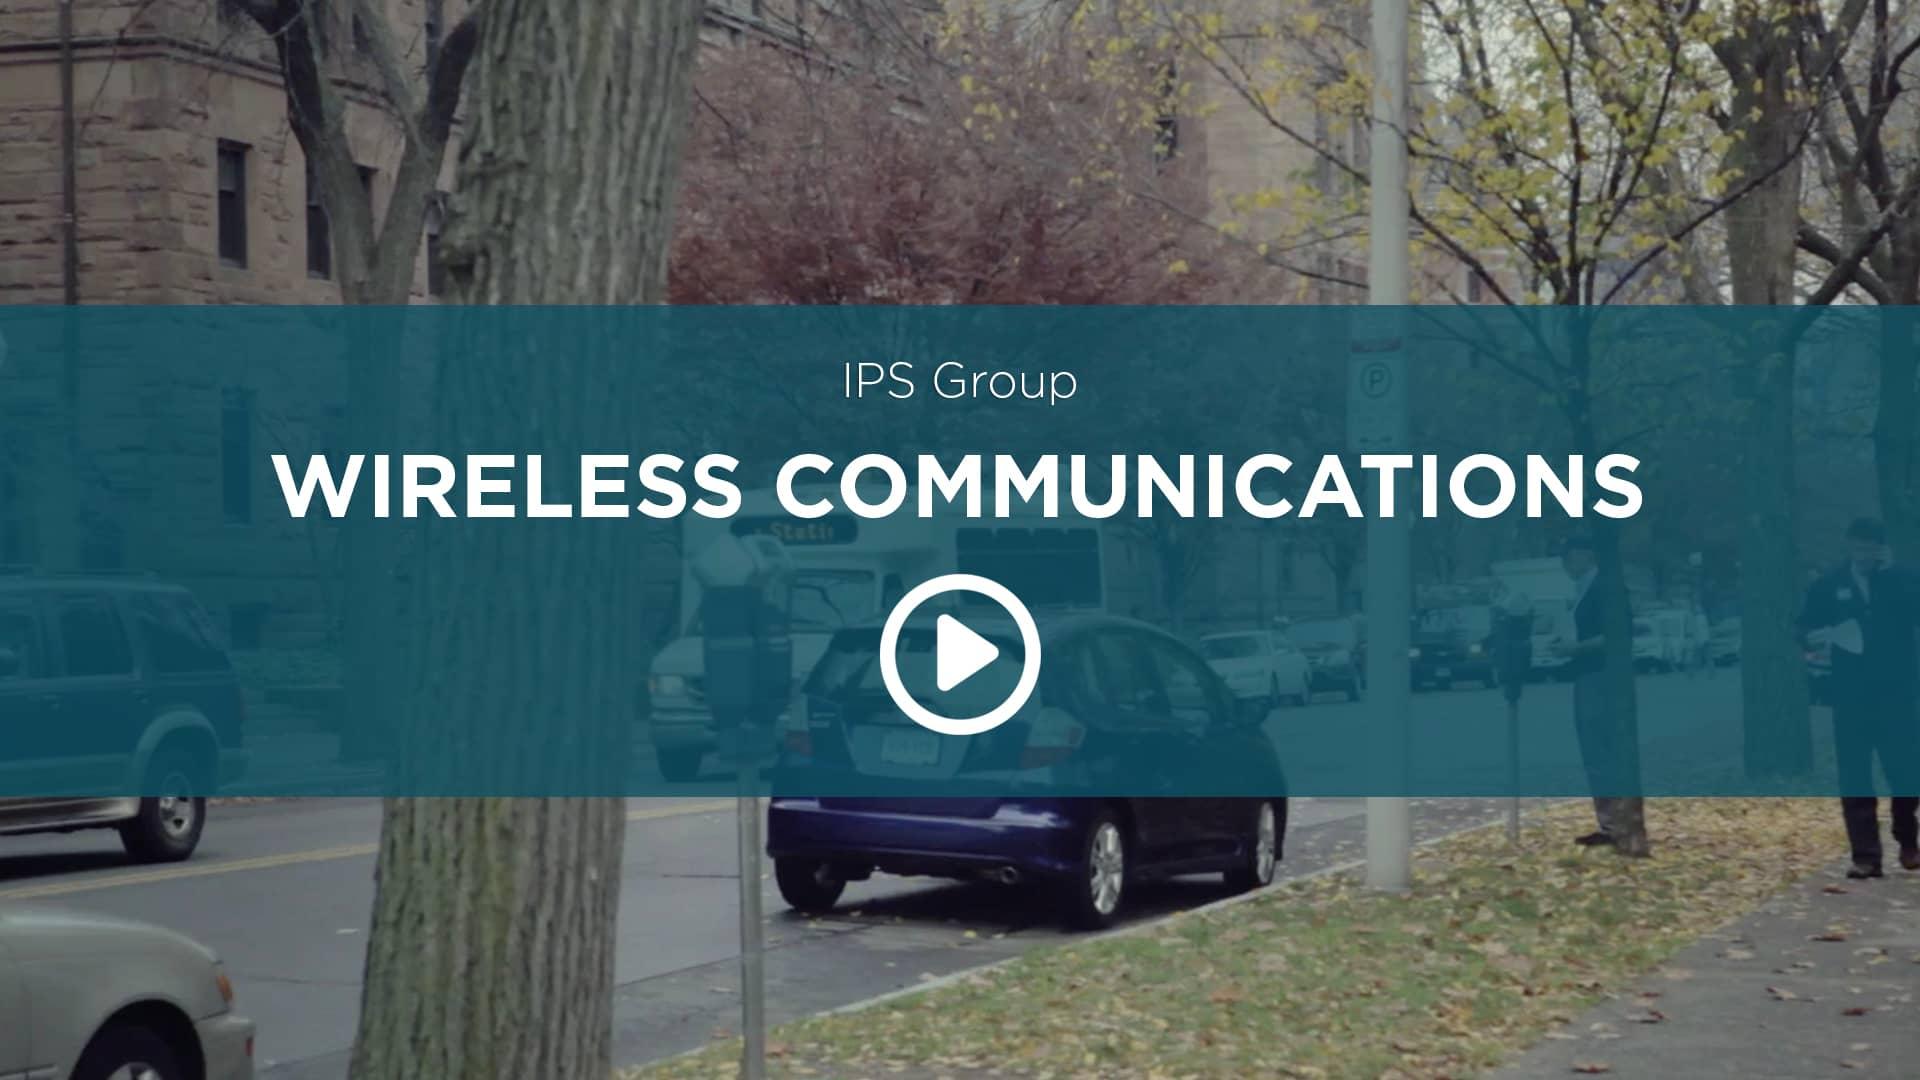 Wireless Communications in Parking